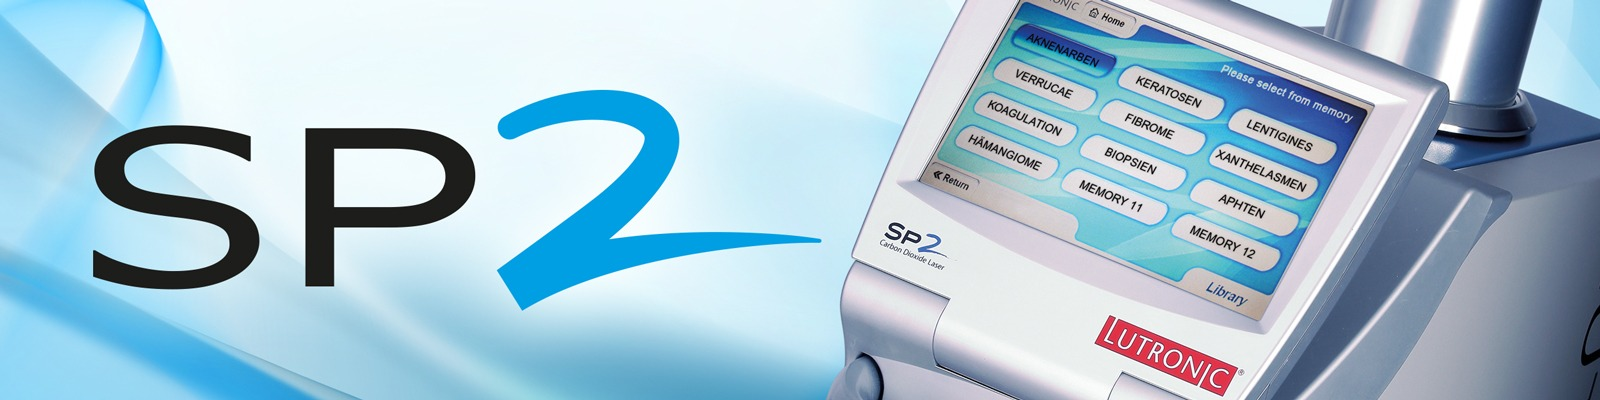 Spectra SP2